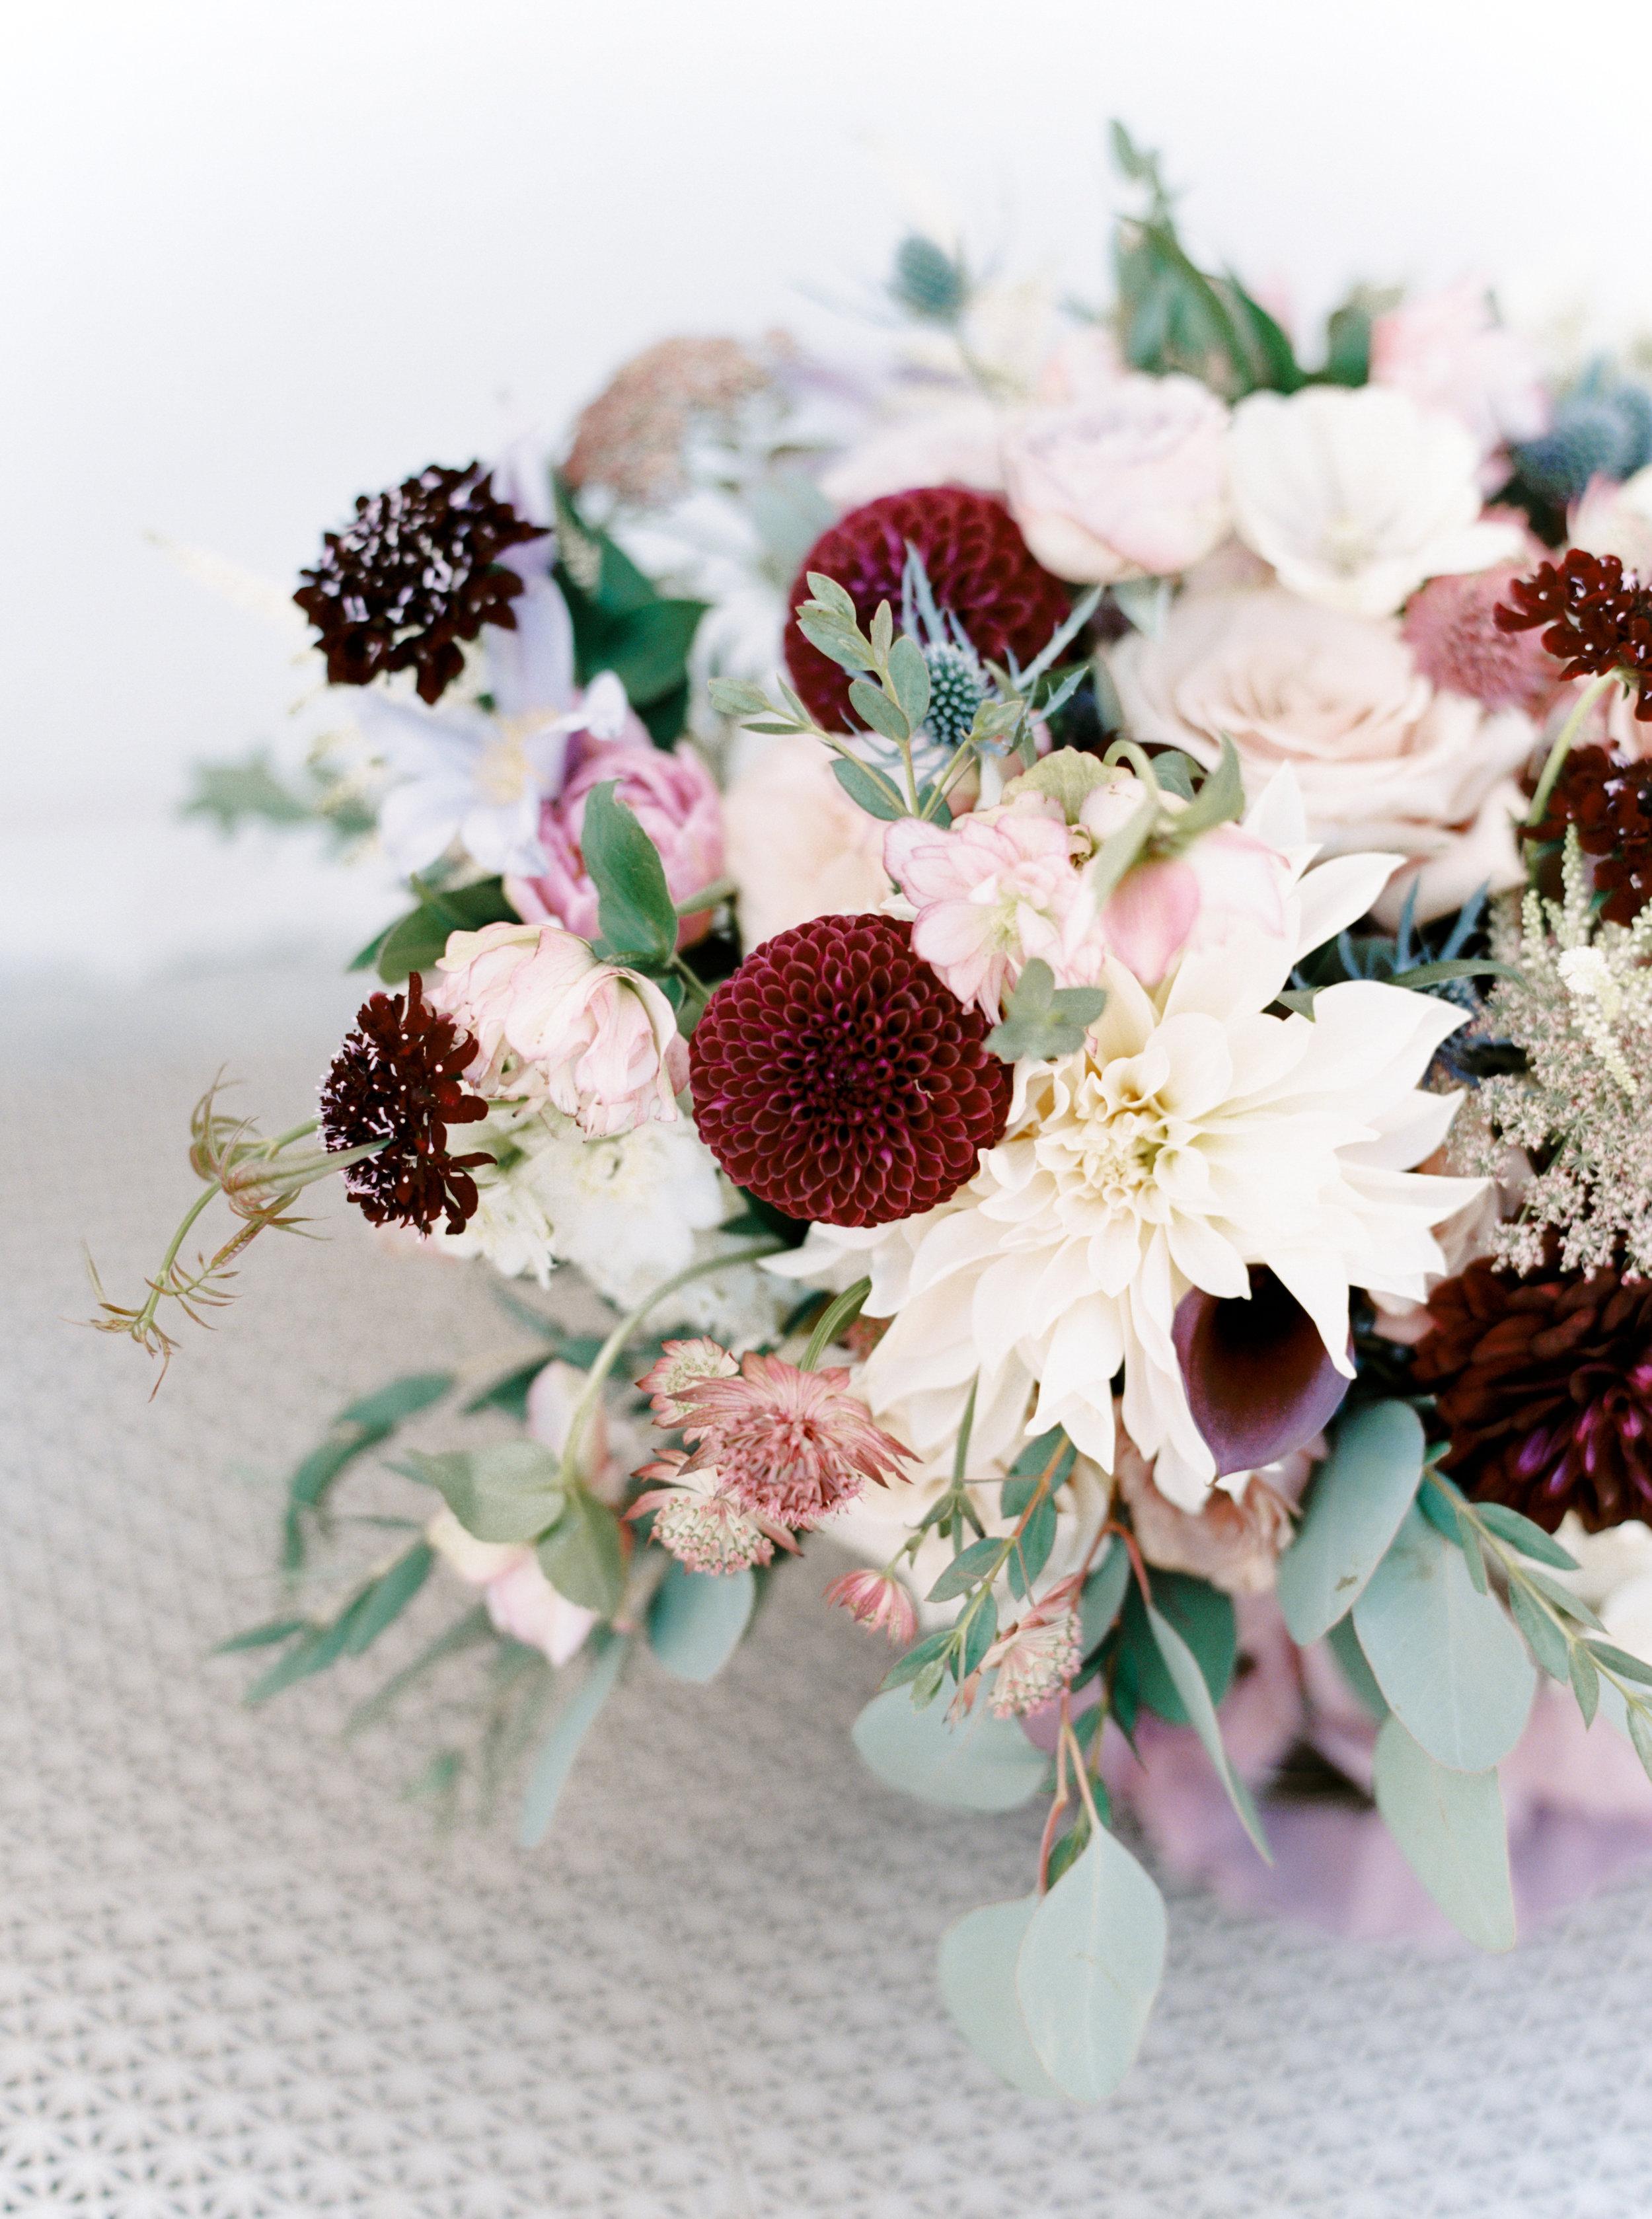 Congressional-Country-Club-wedding-Bathesda-Maryland-wedding-photographer-Richmond-natalie-jayne-photography-image-02-4.jpg